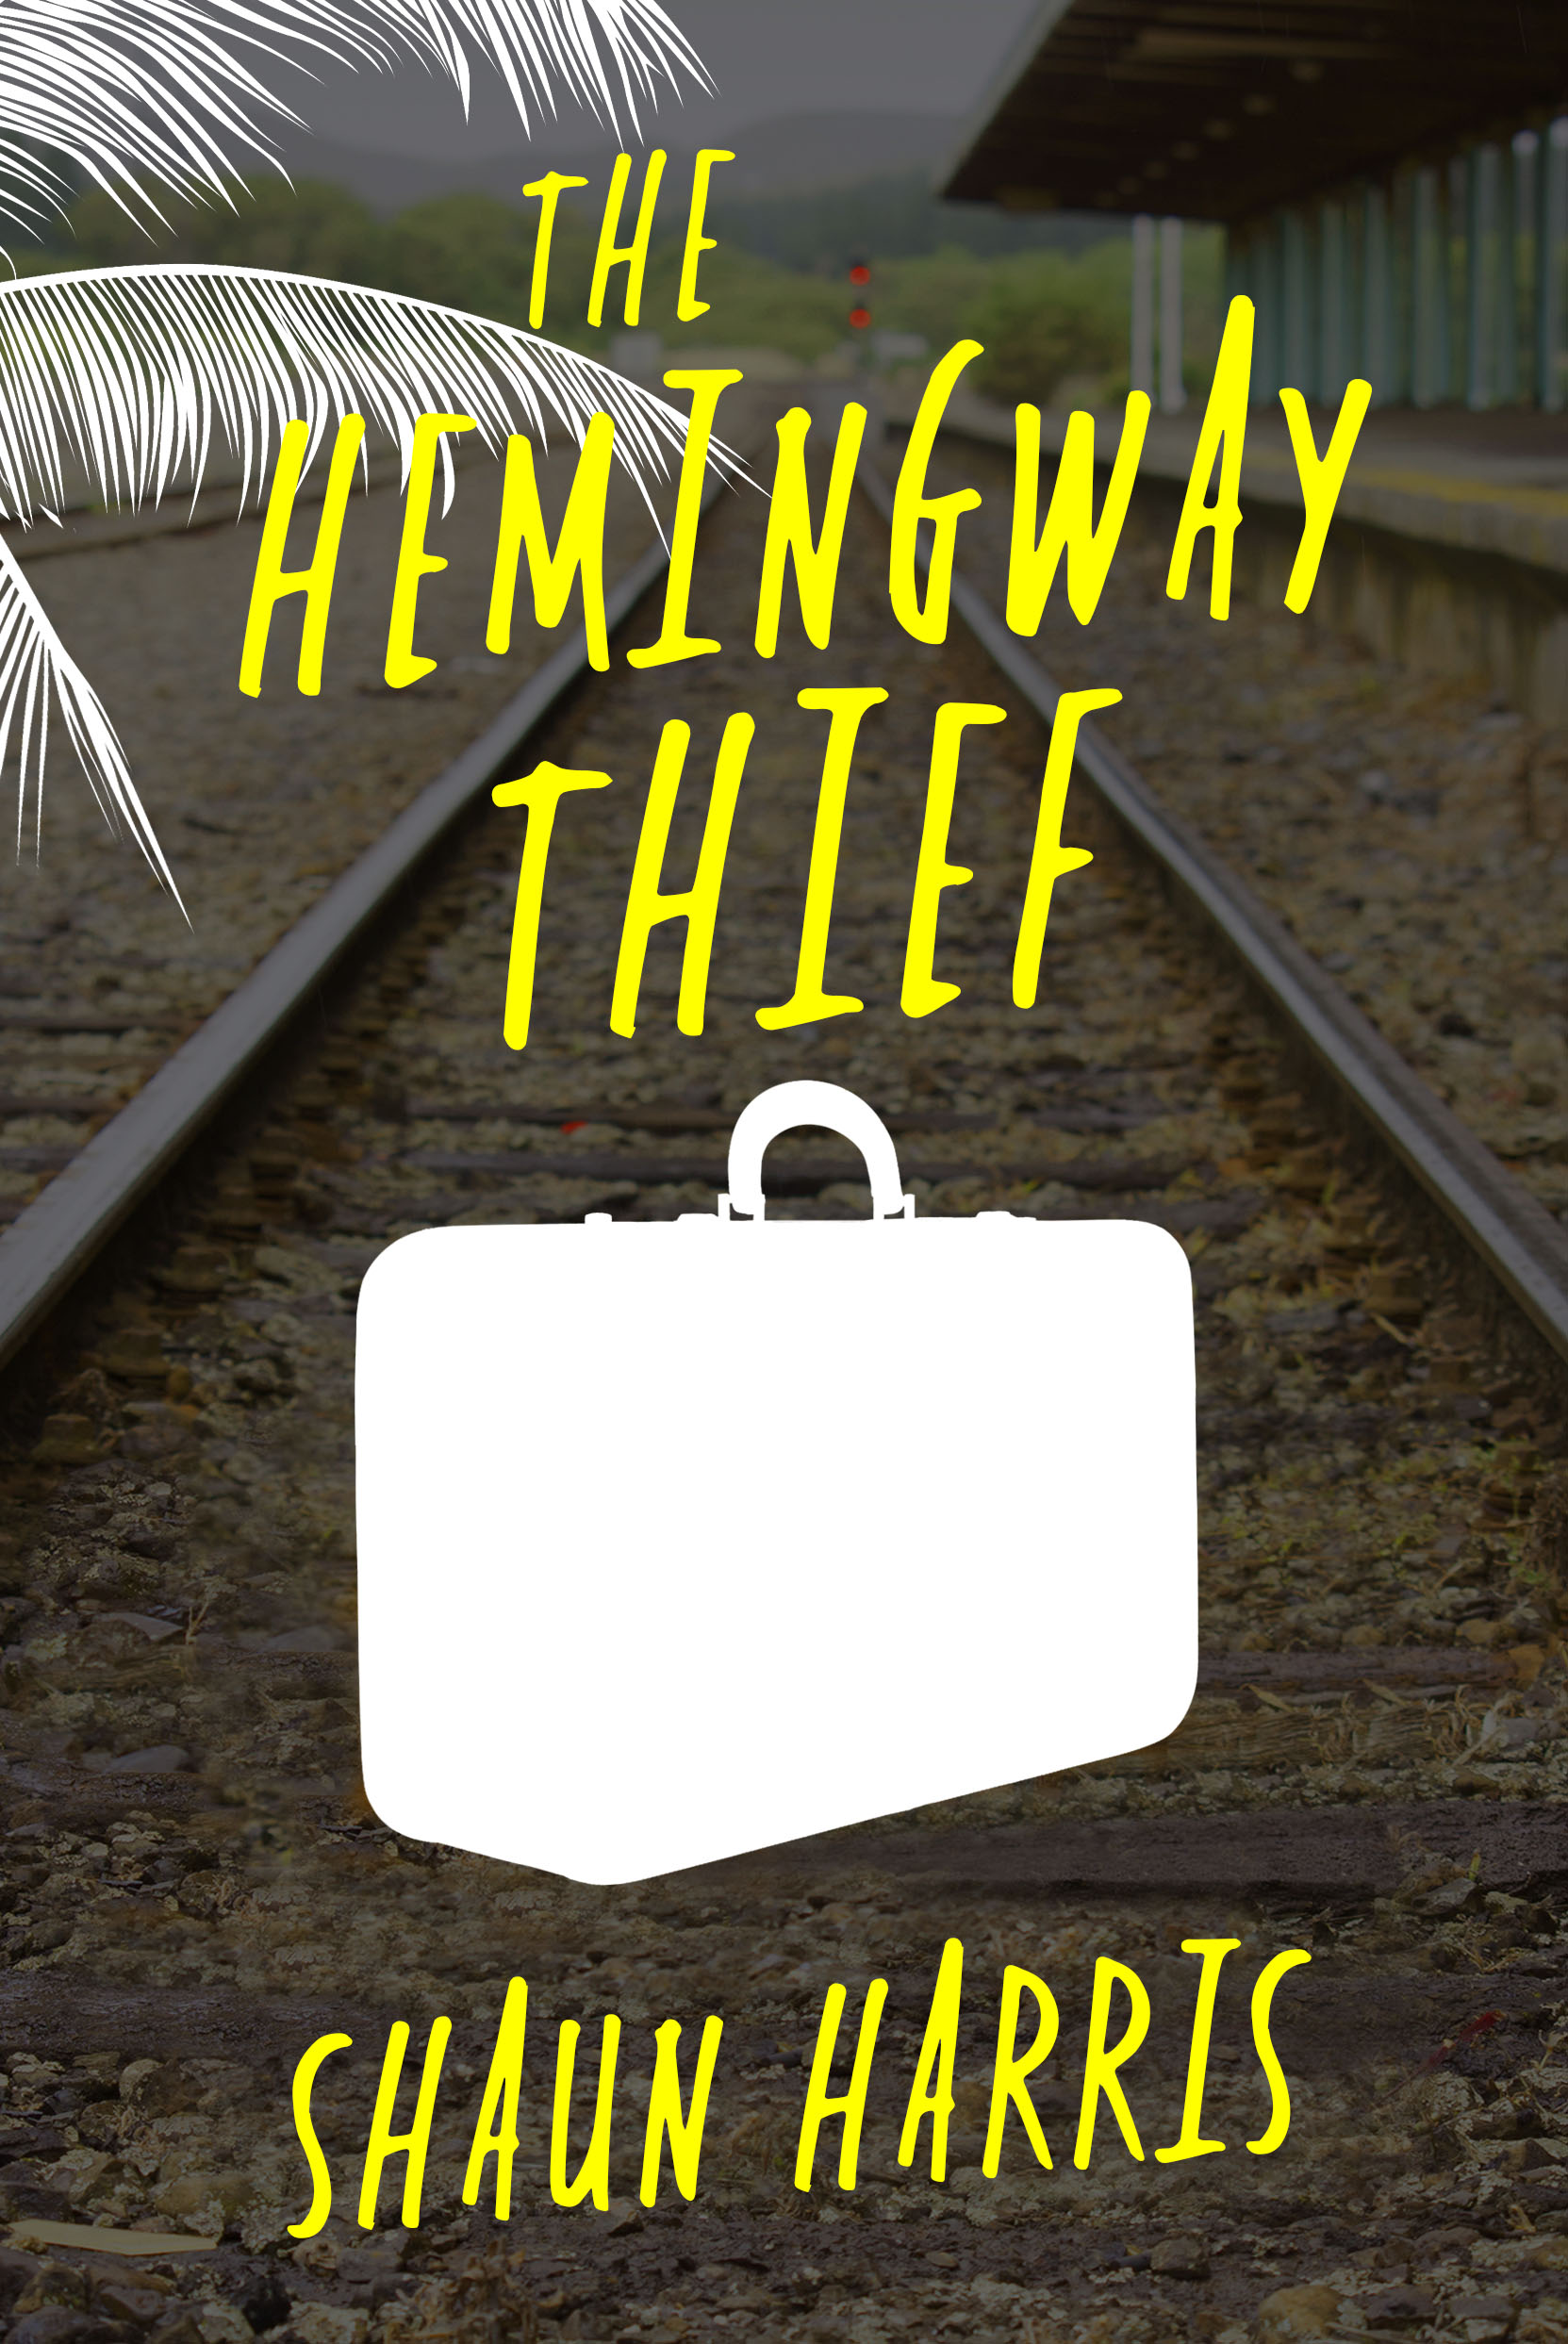 Hemingway Thief_cover